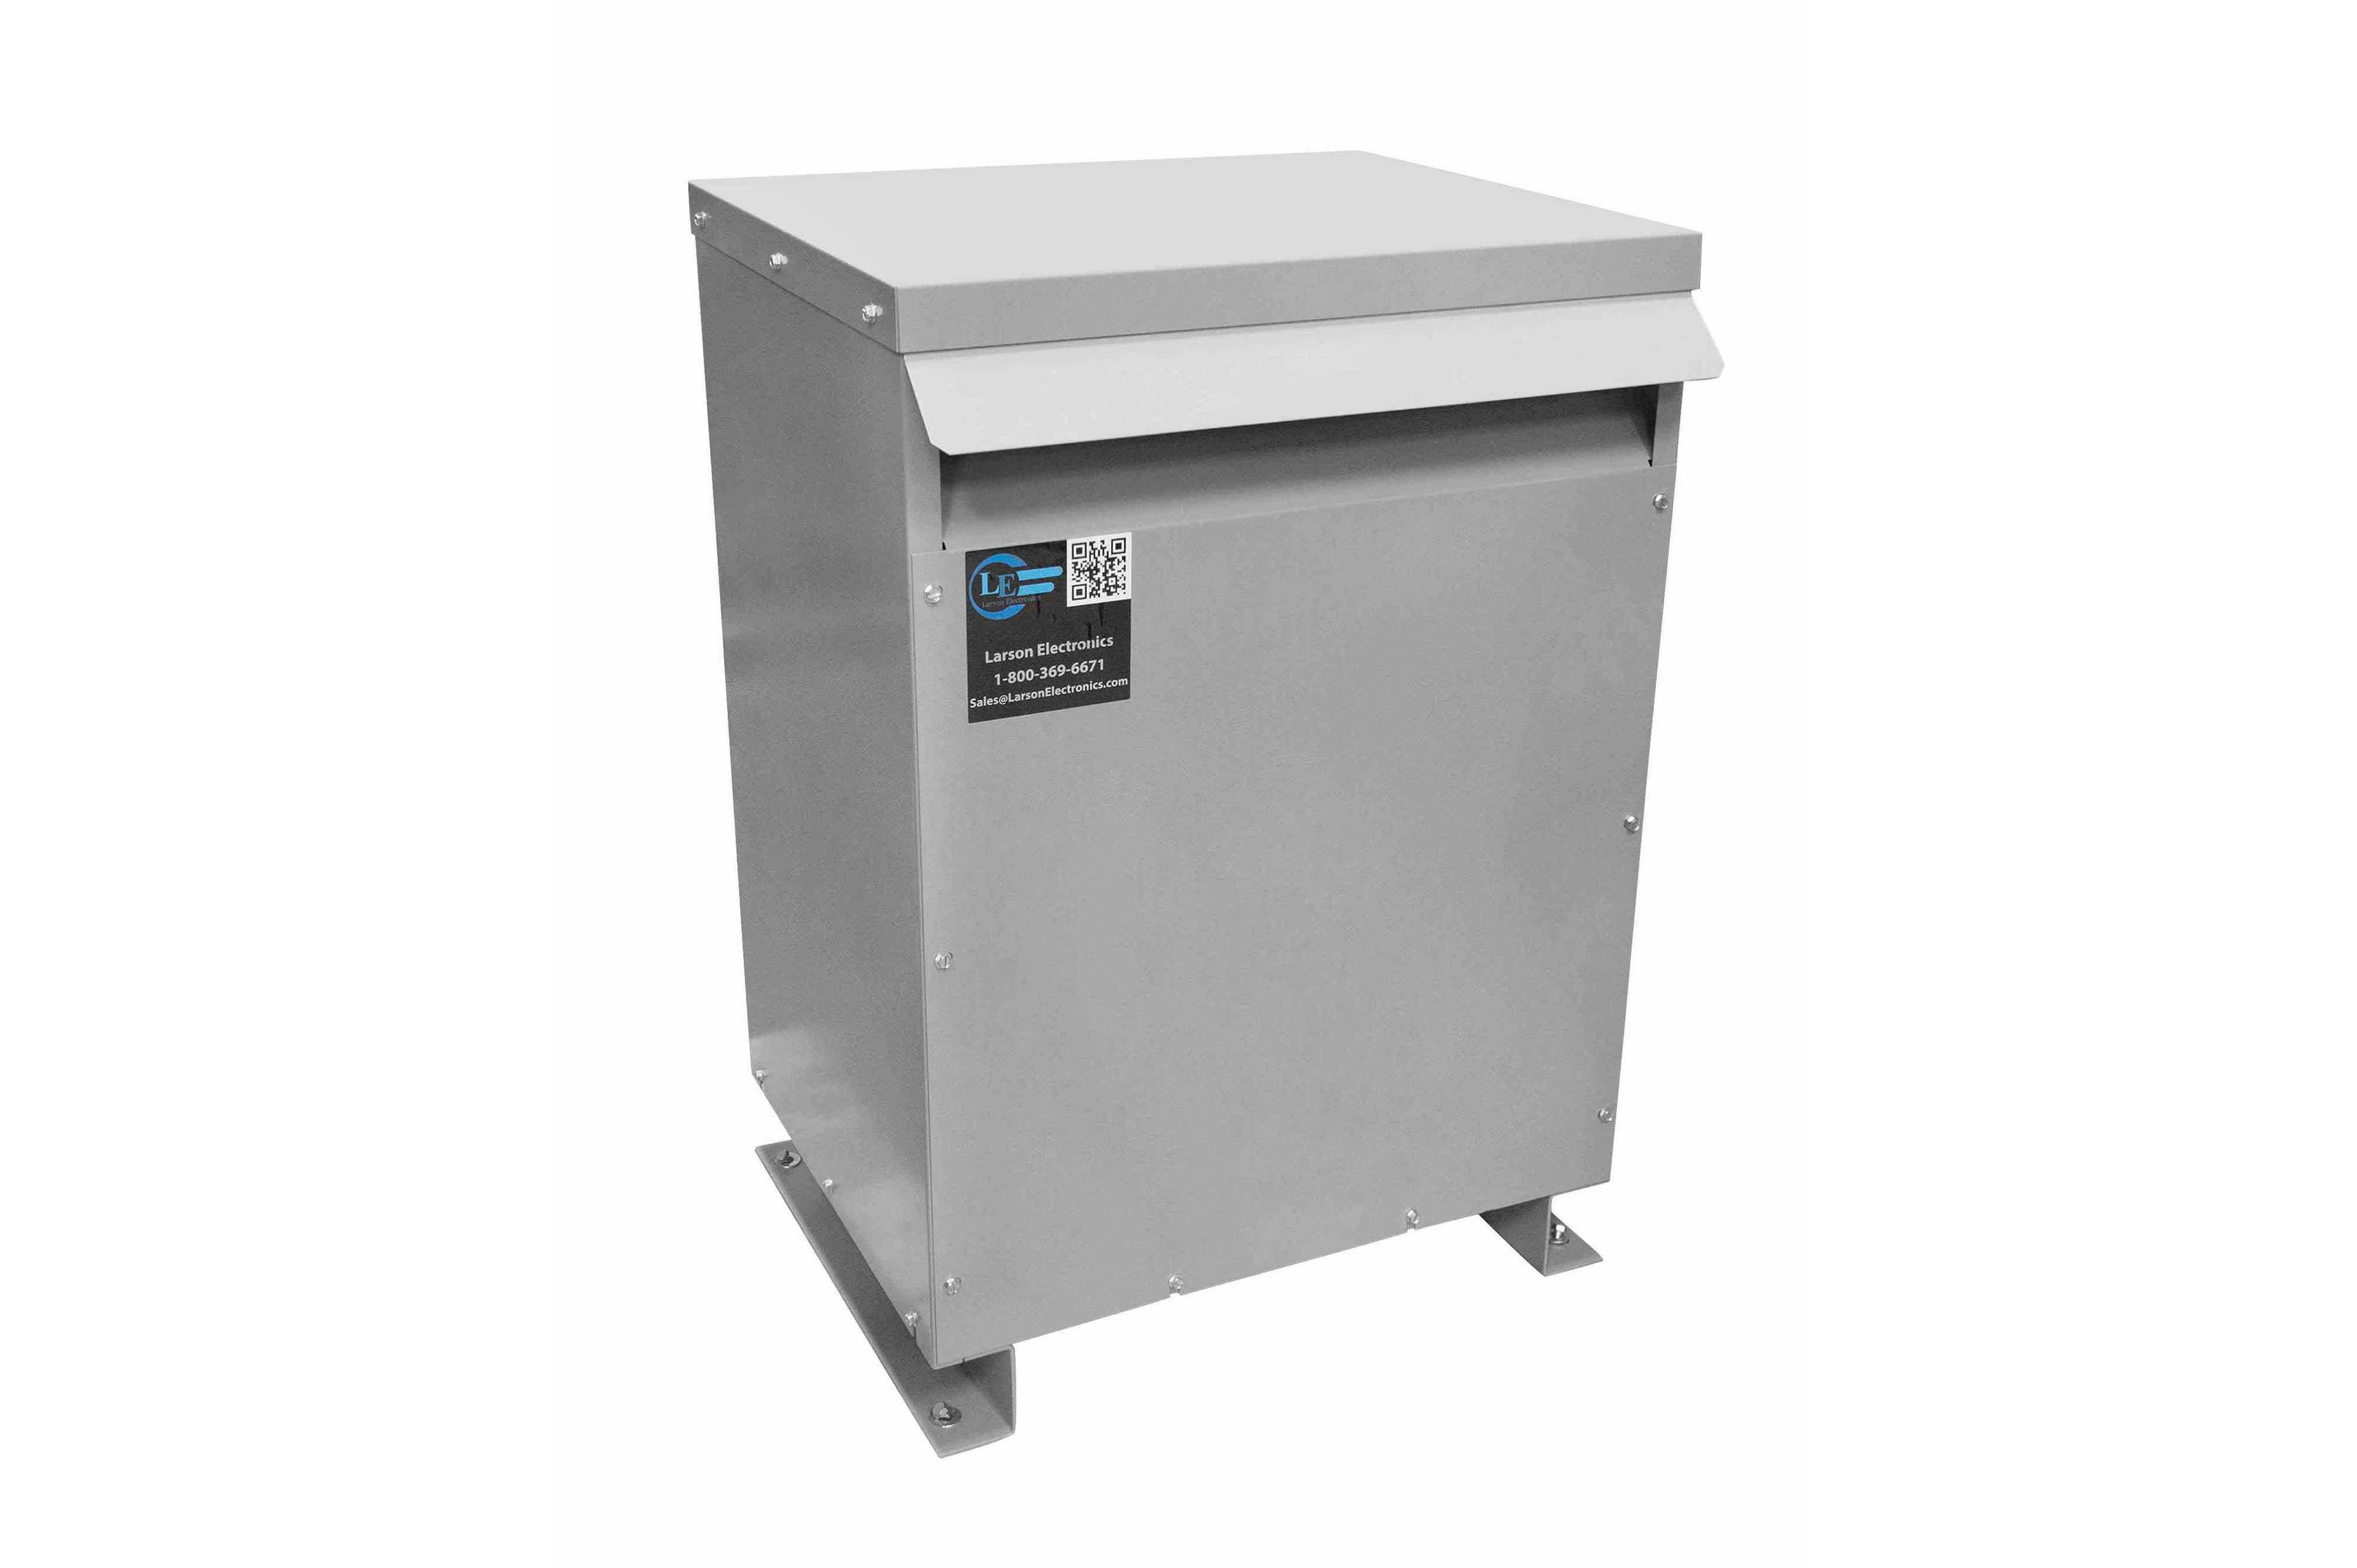 90 kVA 3PH Isolation Transformer, 220V Wye Primary, 480V Delta Secondary, N3R, Ventilated, 60 Hz